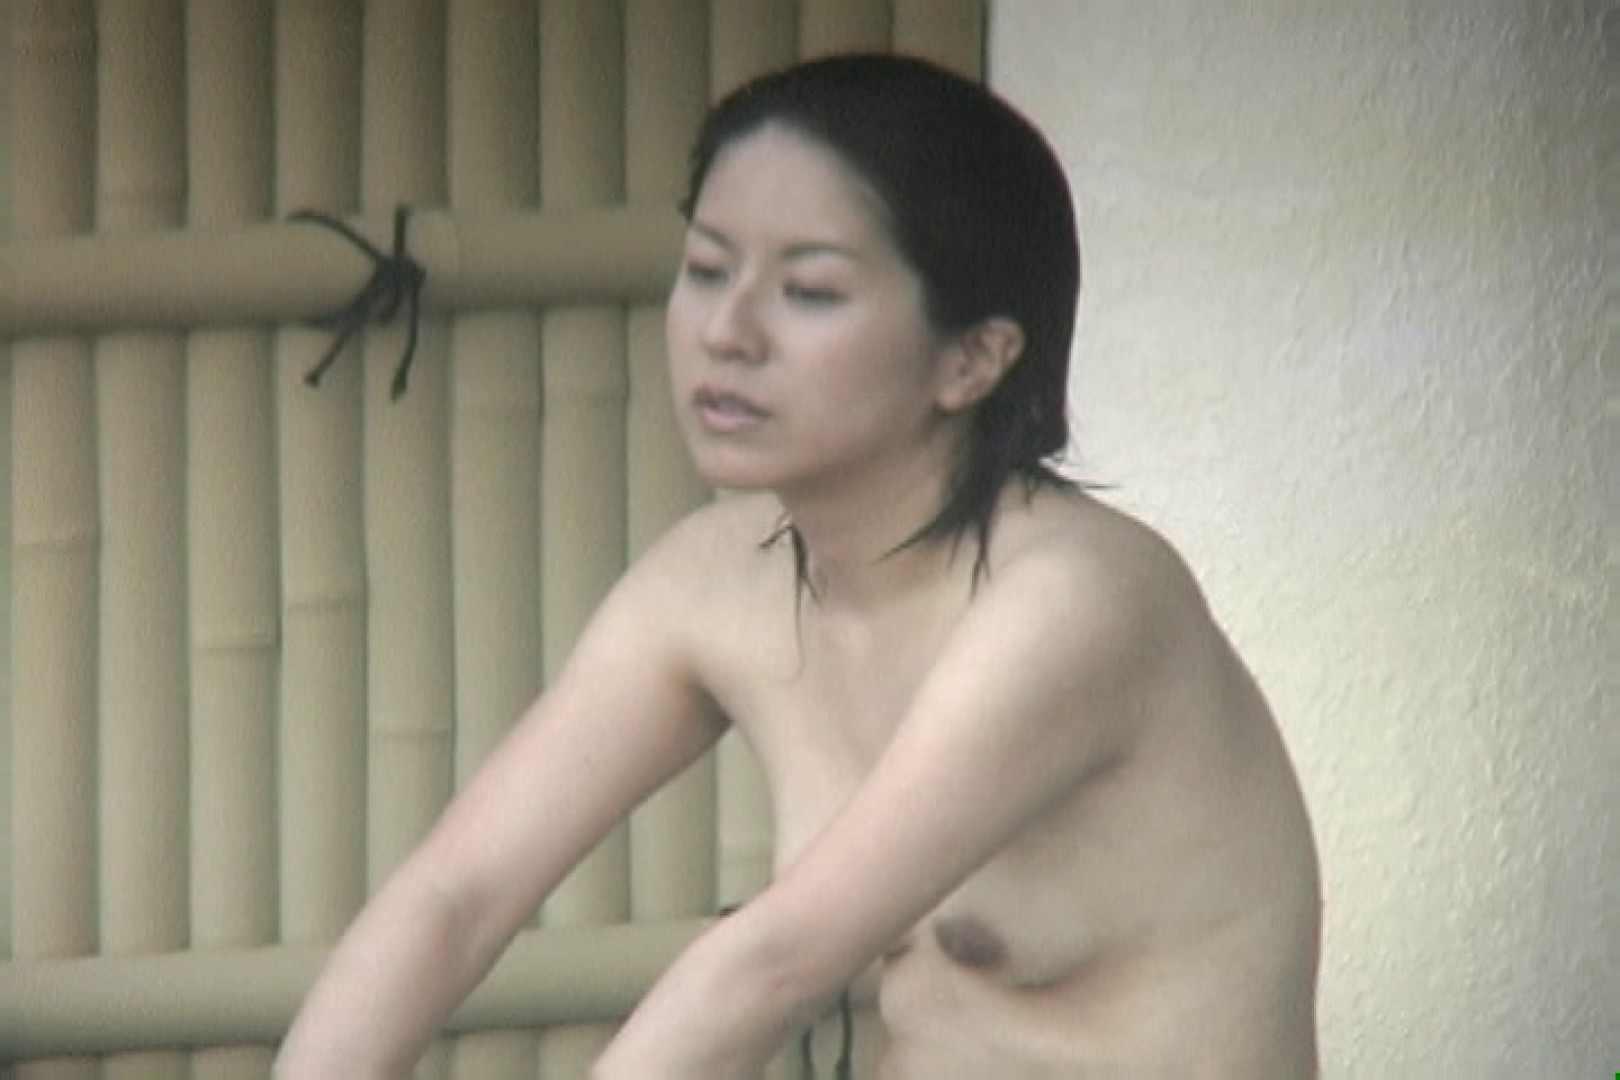 Aquaな露天風呂Vol.694 露天覗き 戯れ無修正画像 110枚